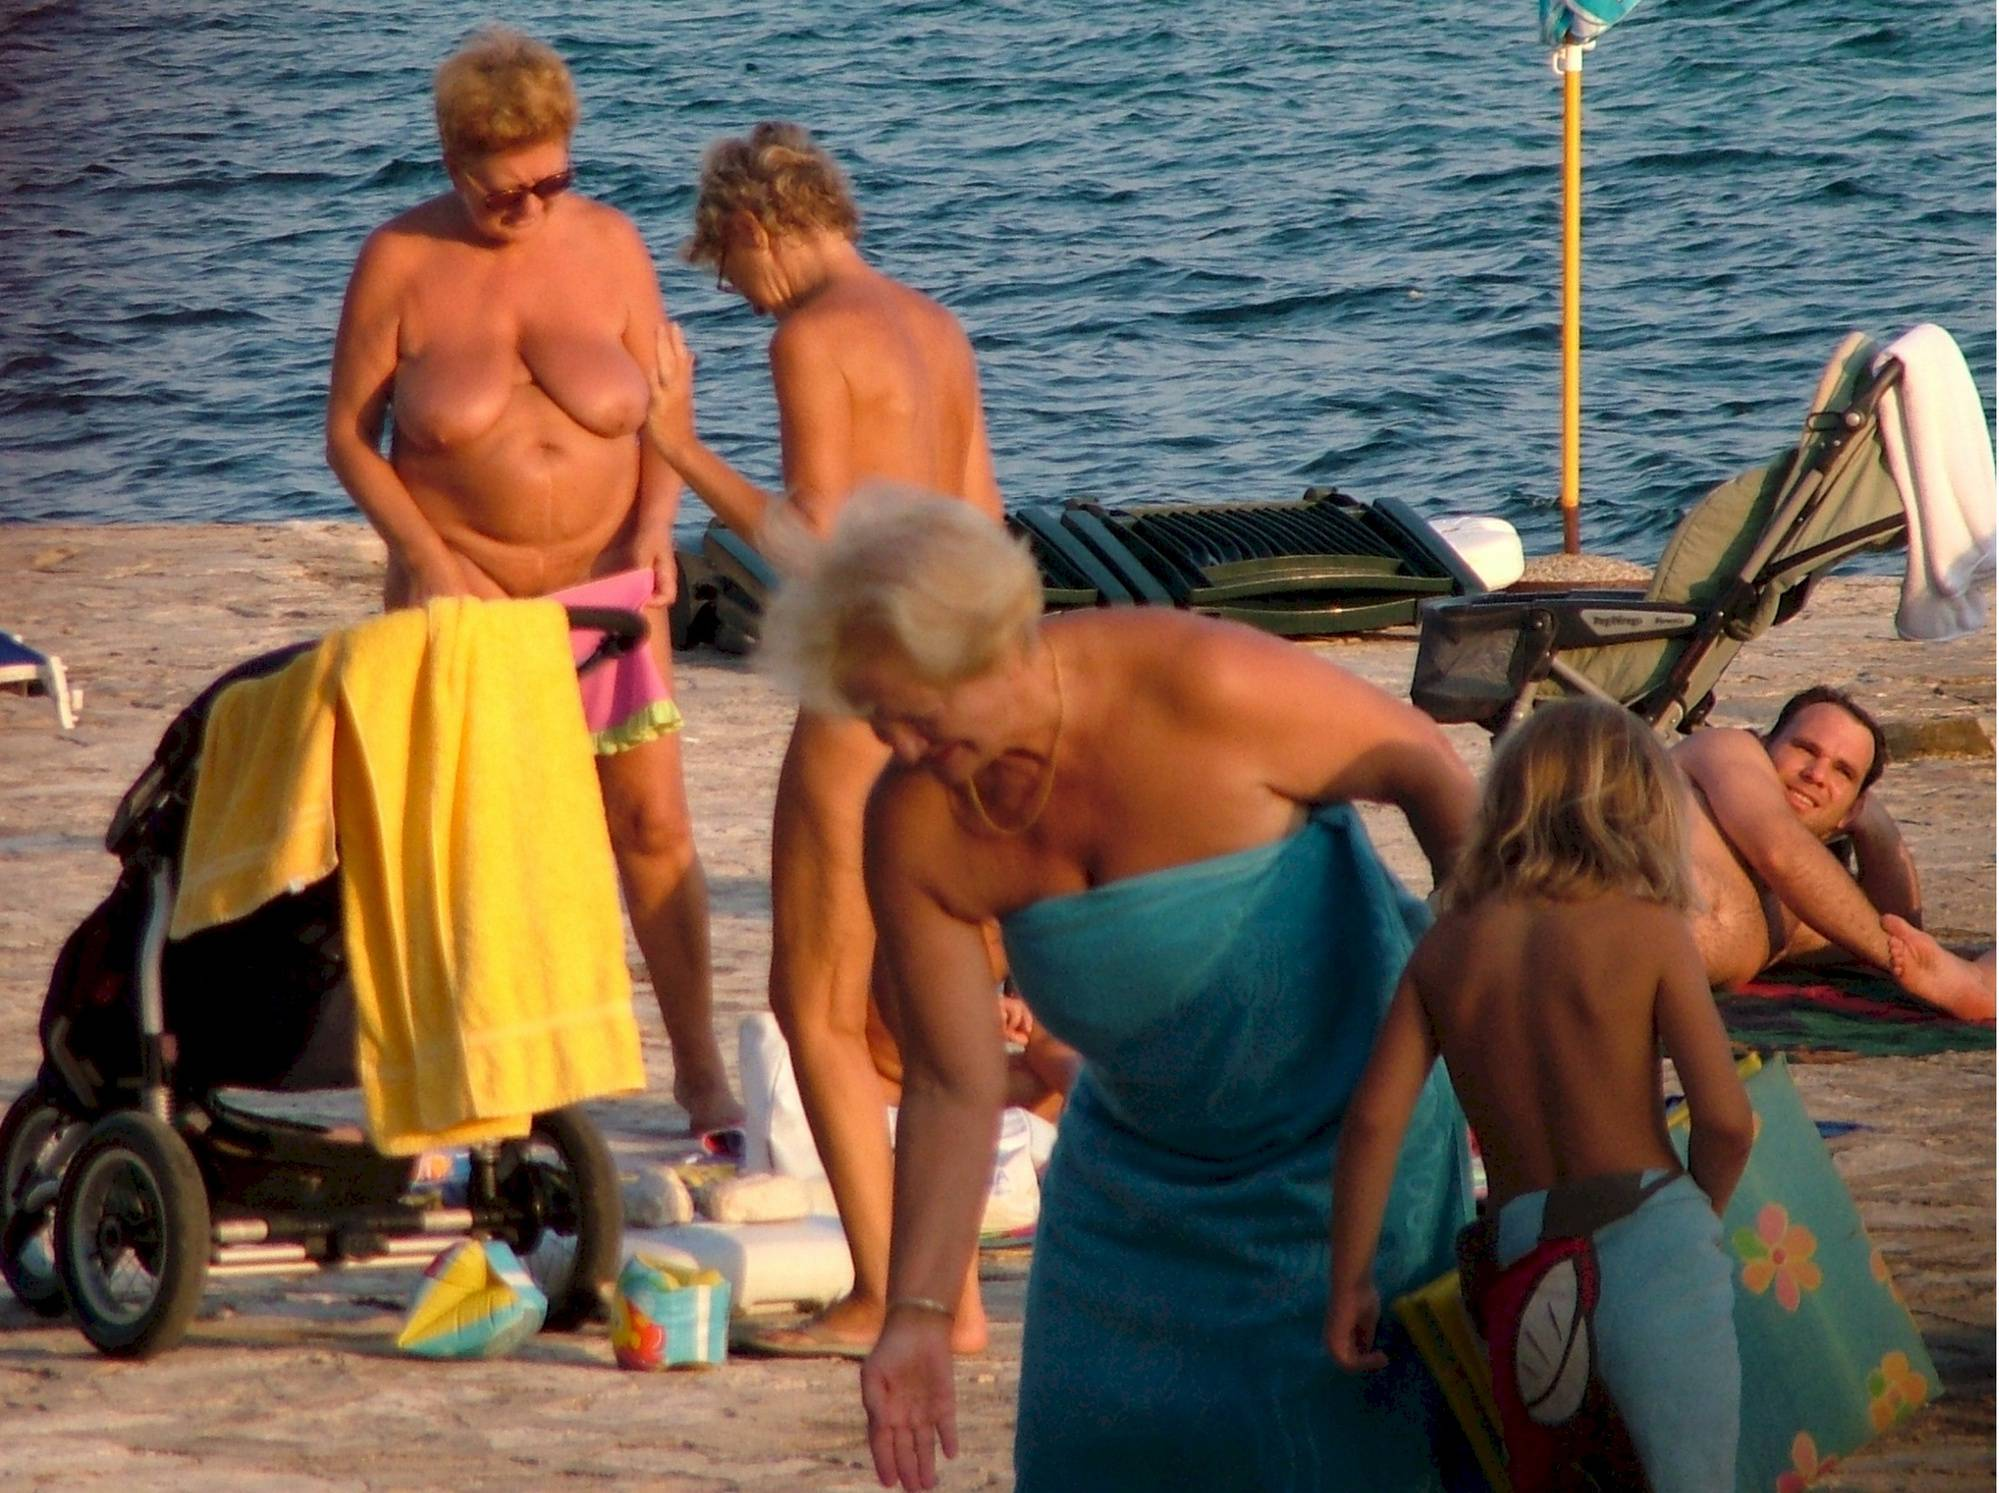 Pure Nudism Photos-FKK Reflection Sun Beach - 1